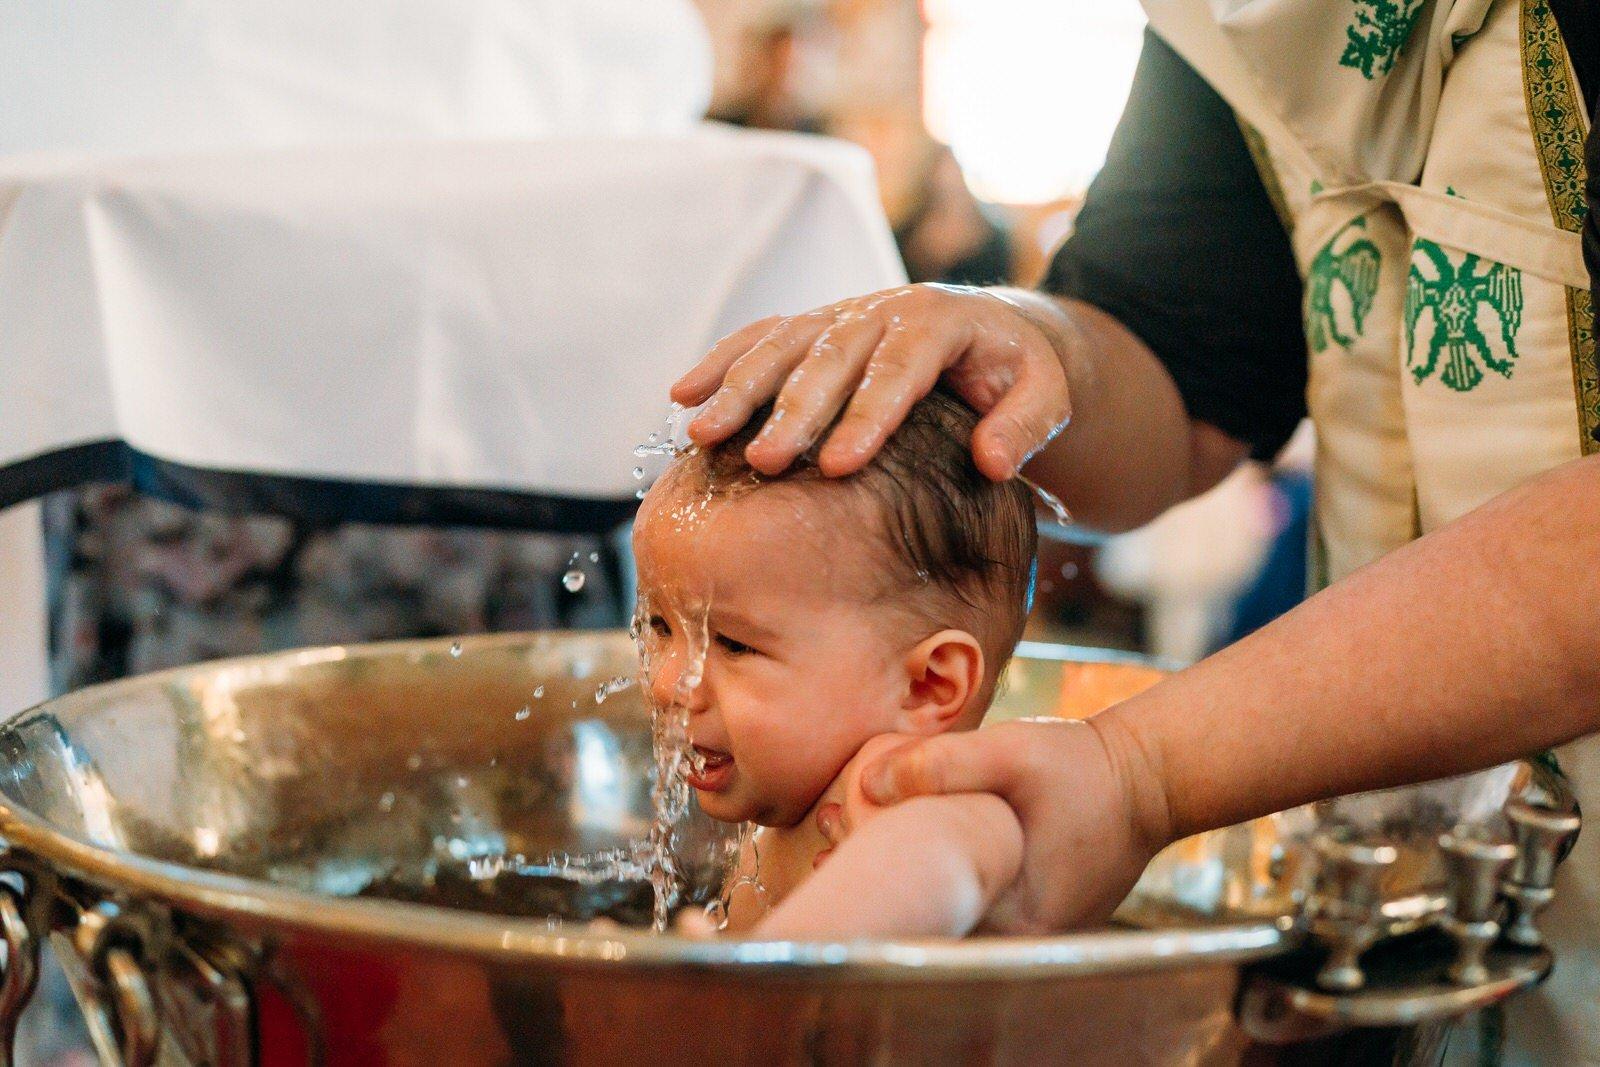 yianni-baptism-st-catherine-orthodox-mascot-laqua-113